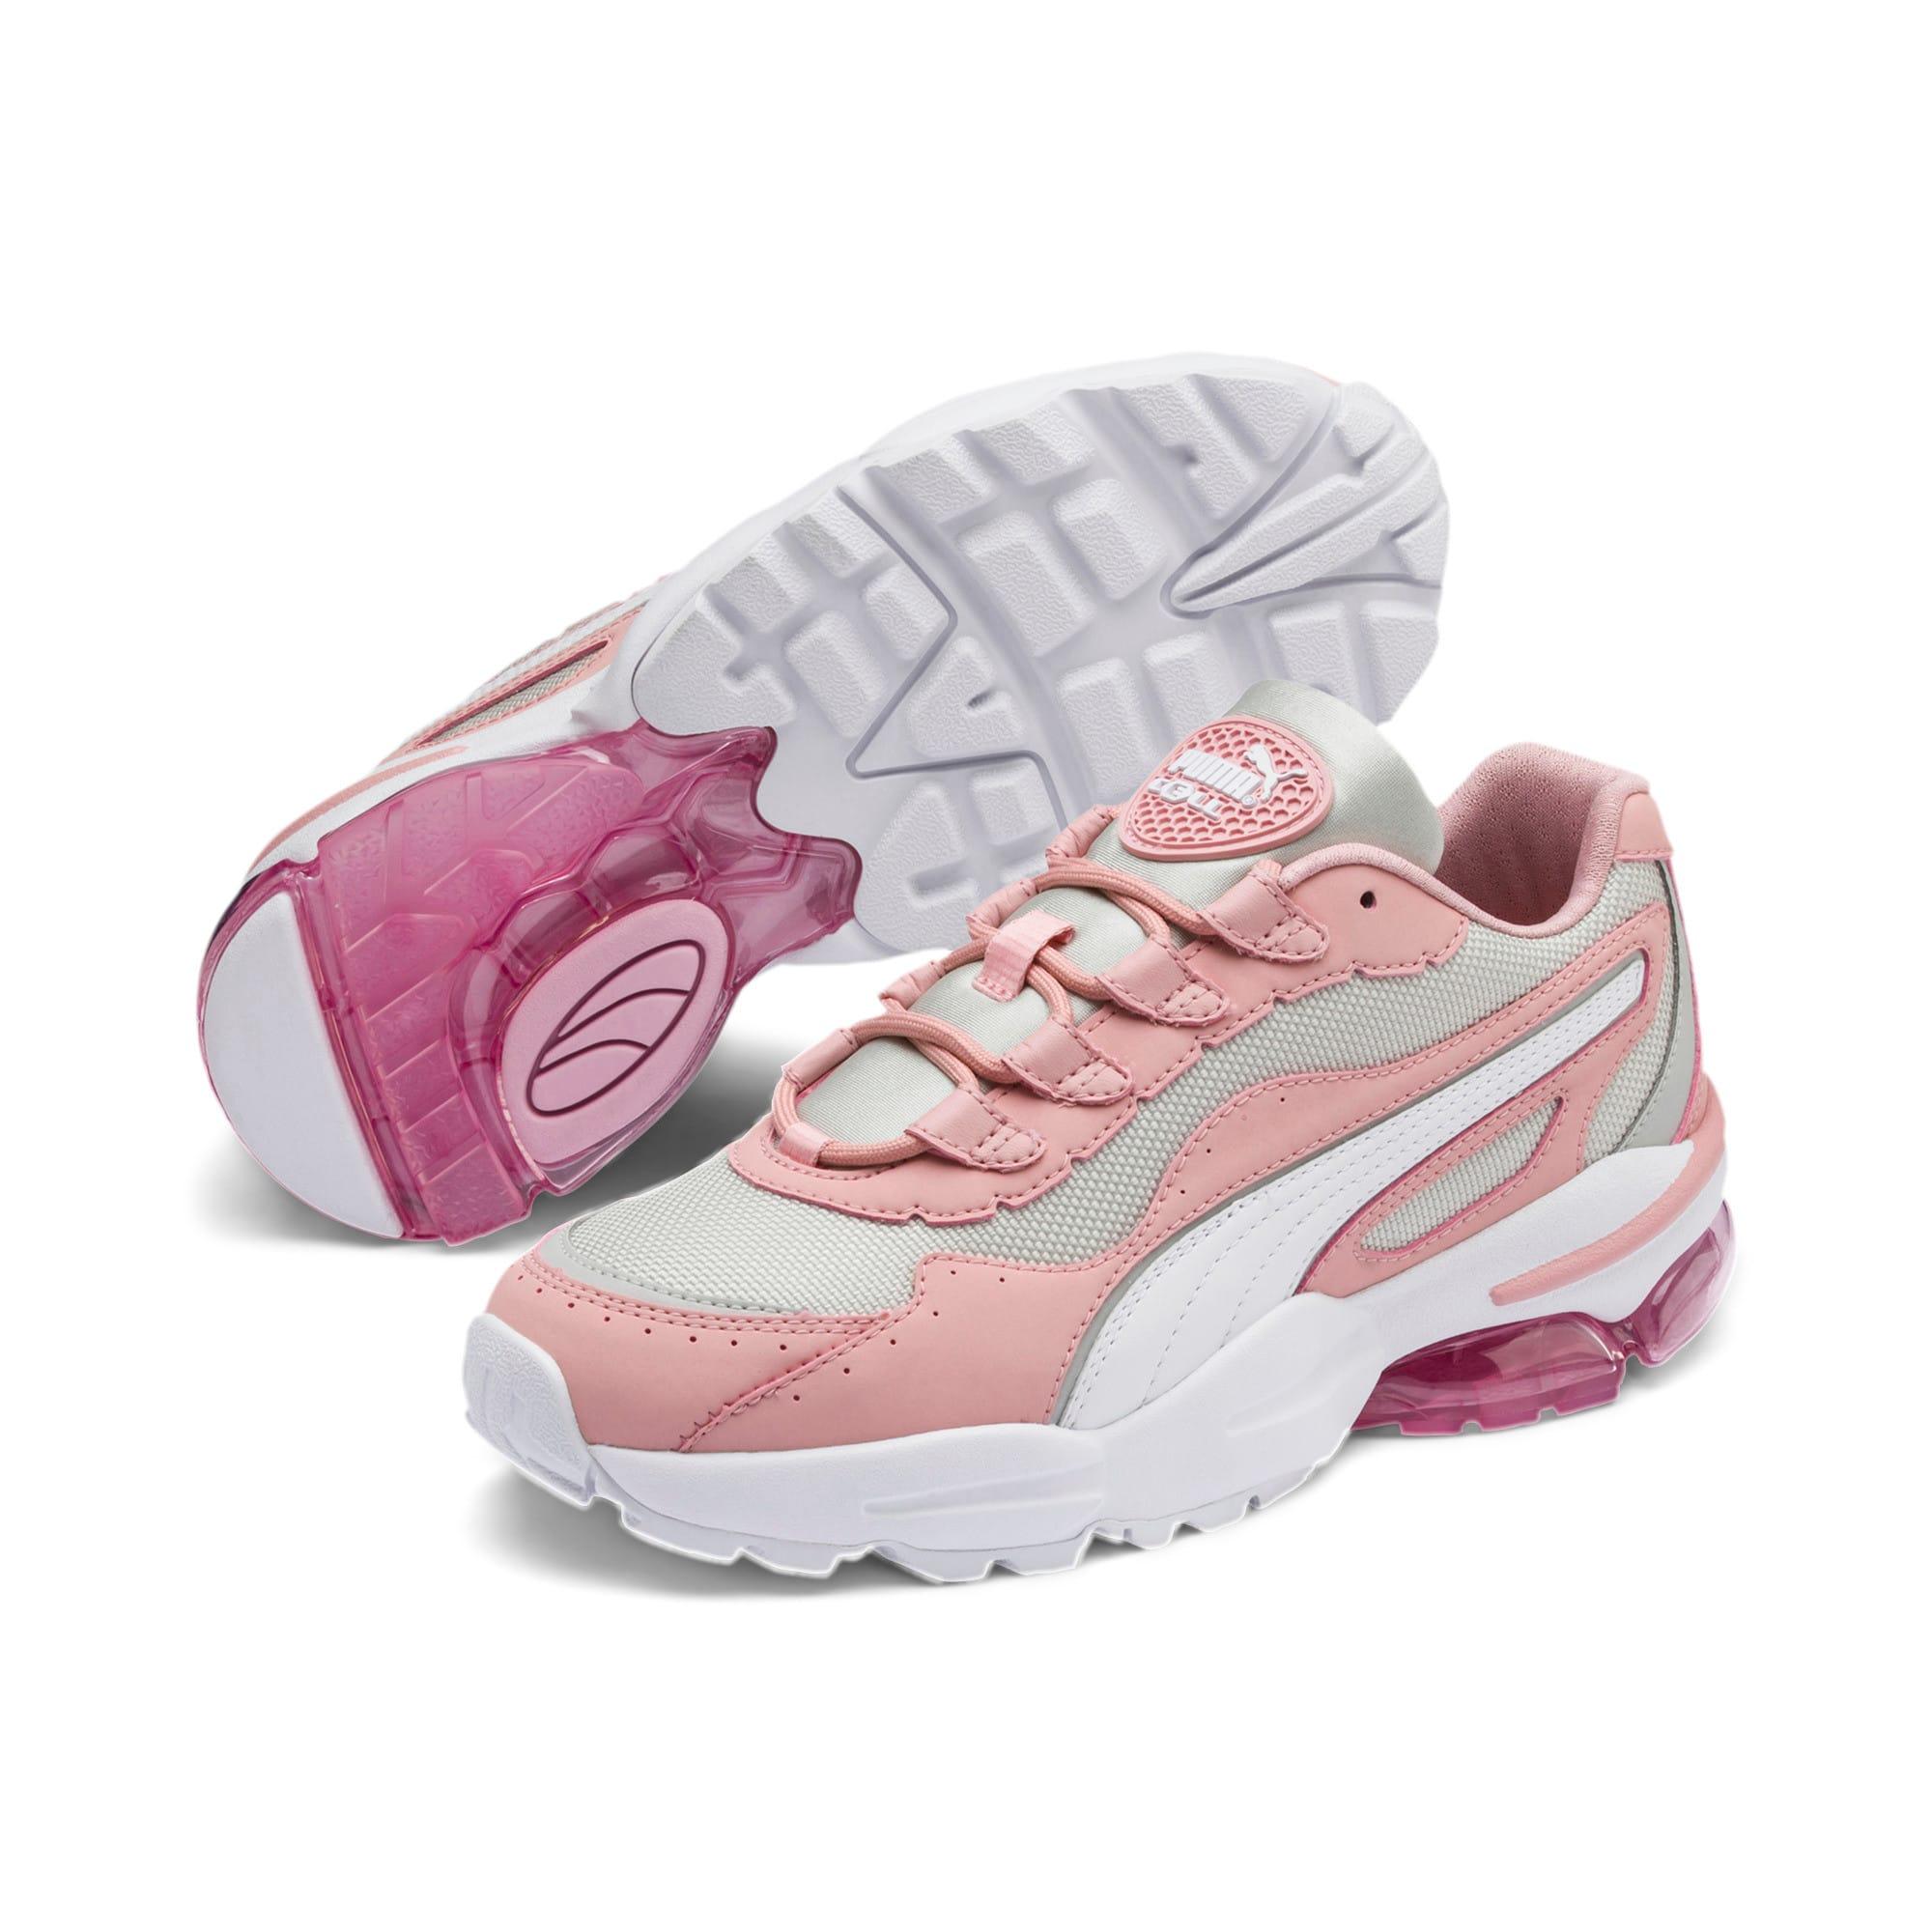 Miniatura 3 de Zapatos deportivos CELL Stellar para mujer, Bridal Rose-Gray Violet, mediano